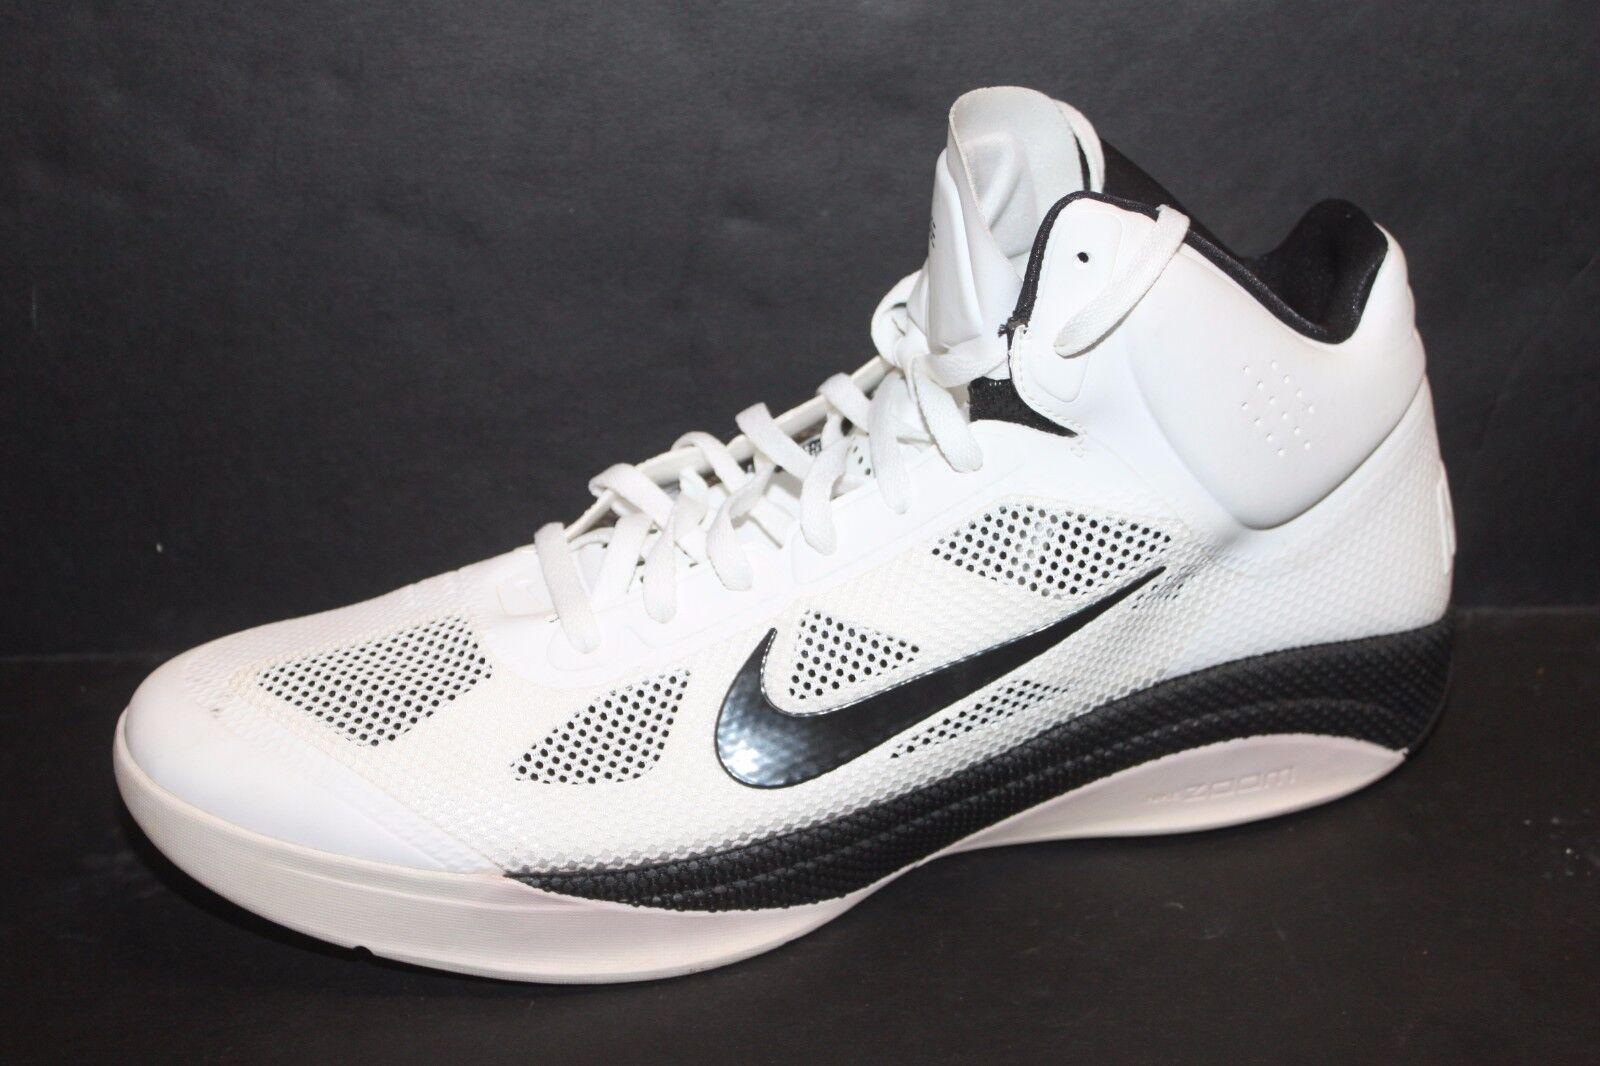 Nike Hyperfuse 2018 White/Black 407623-100 Men's Price reduction